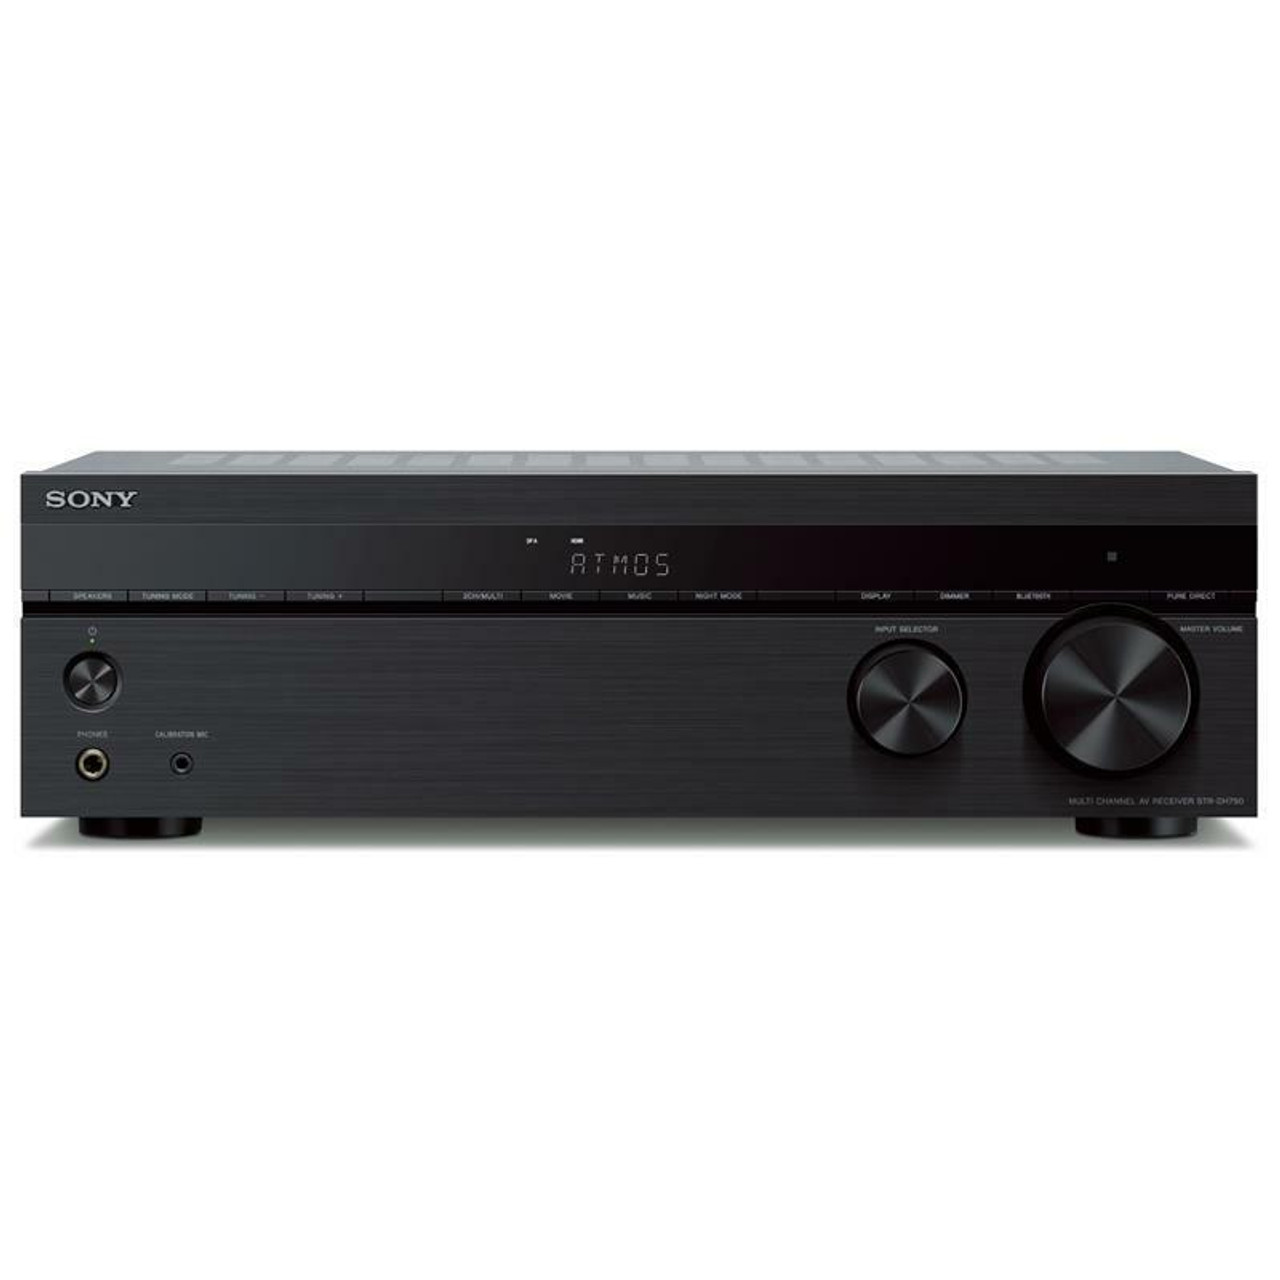 Sony STRDH790 7.2ch Home Theatre AV Receiver - RRP $849.00 - HURRY LAST 4!